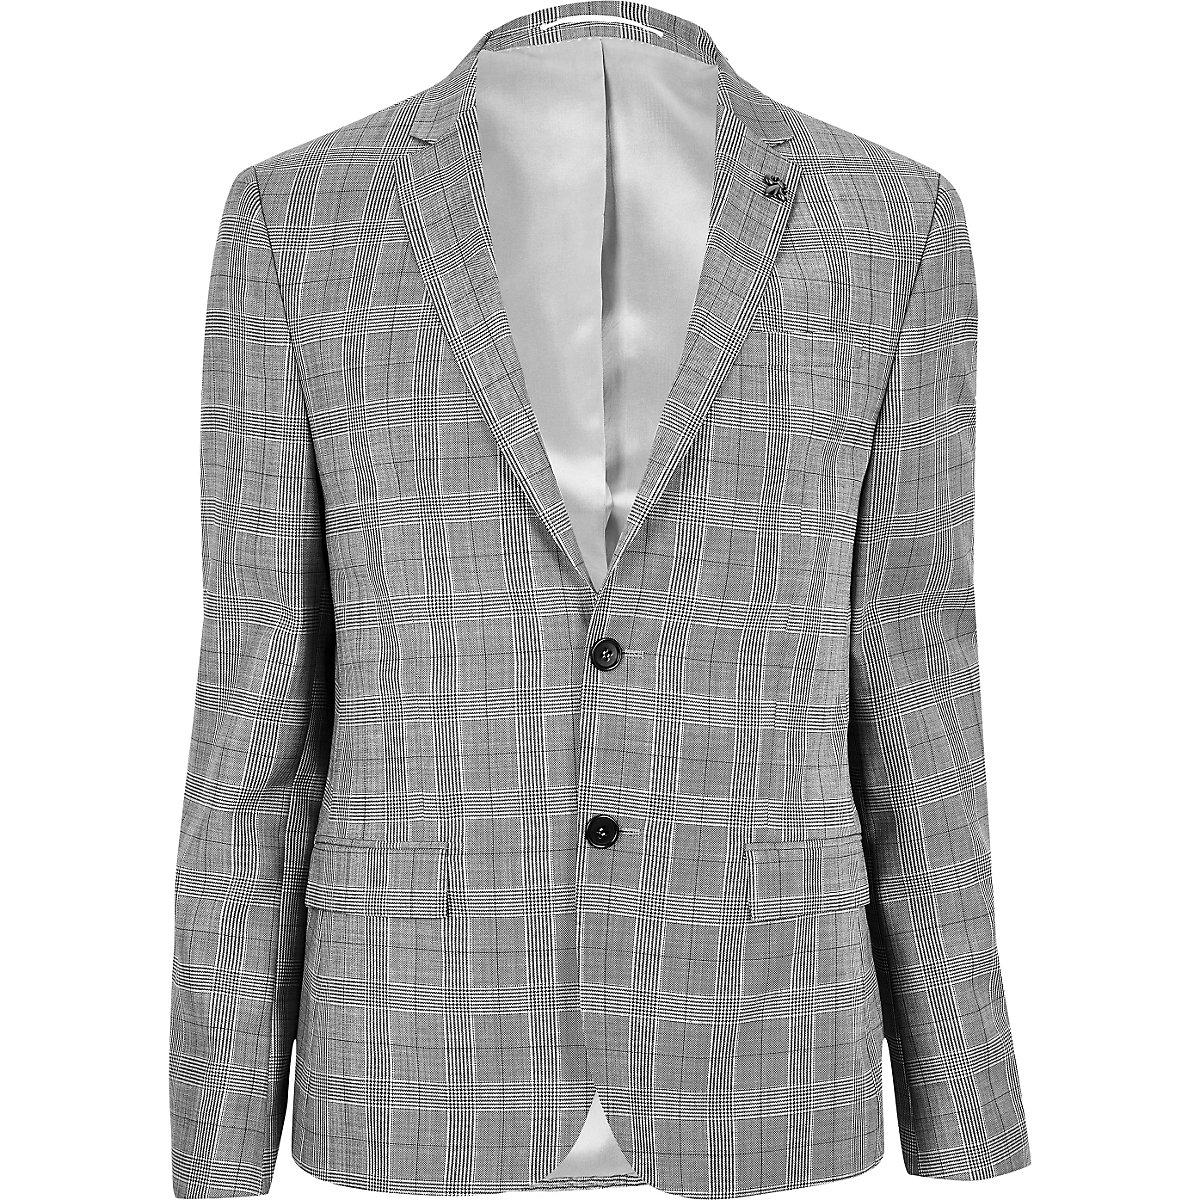 Ecru skinny fit suit jacket